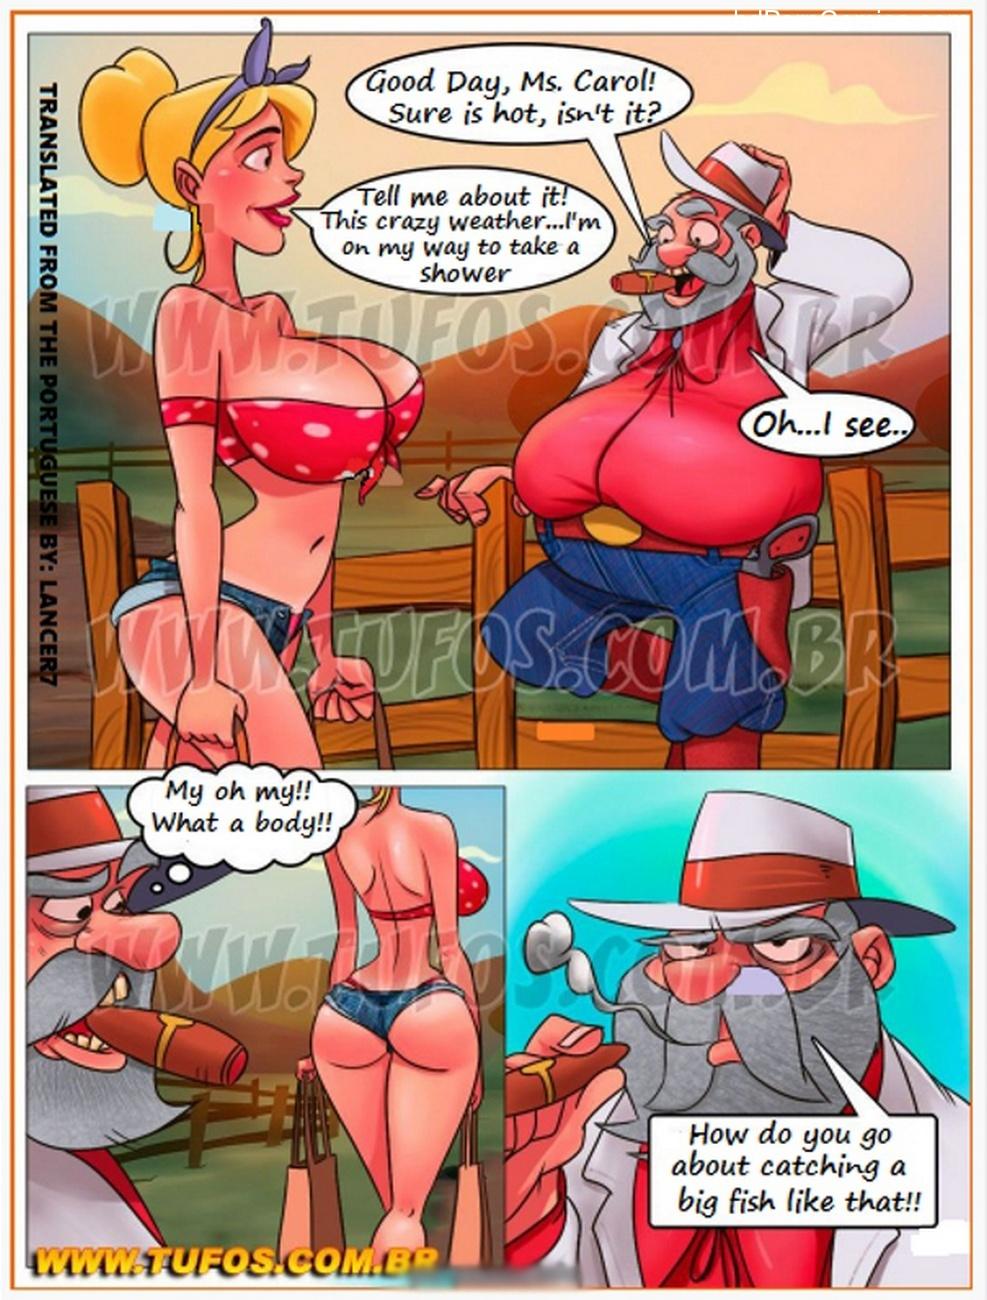 vespa and naked woman